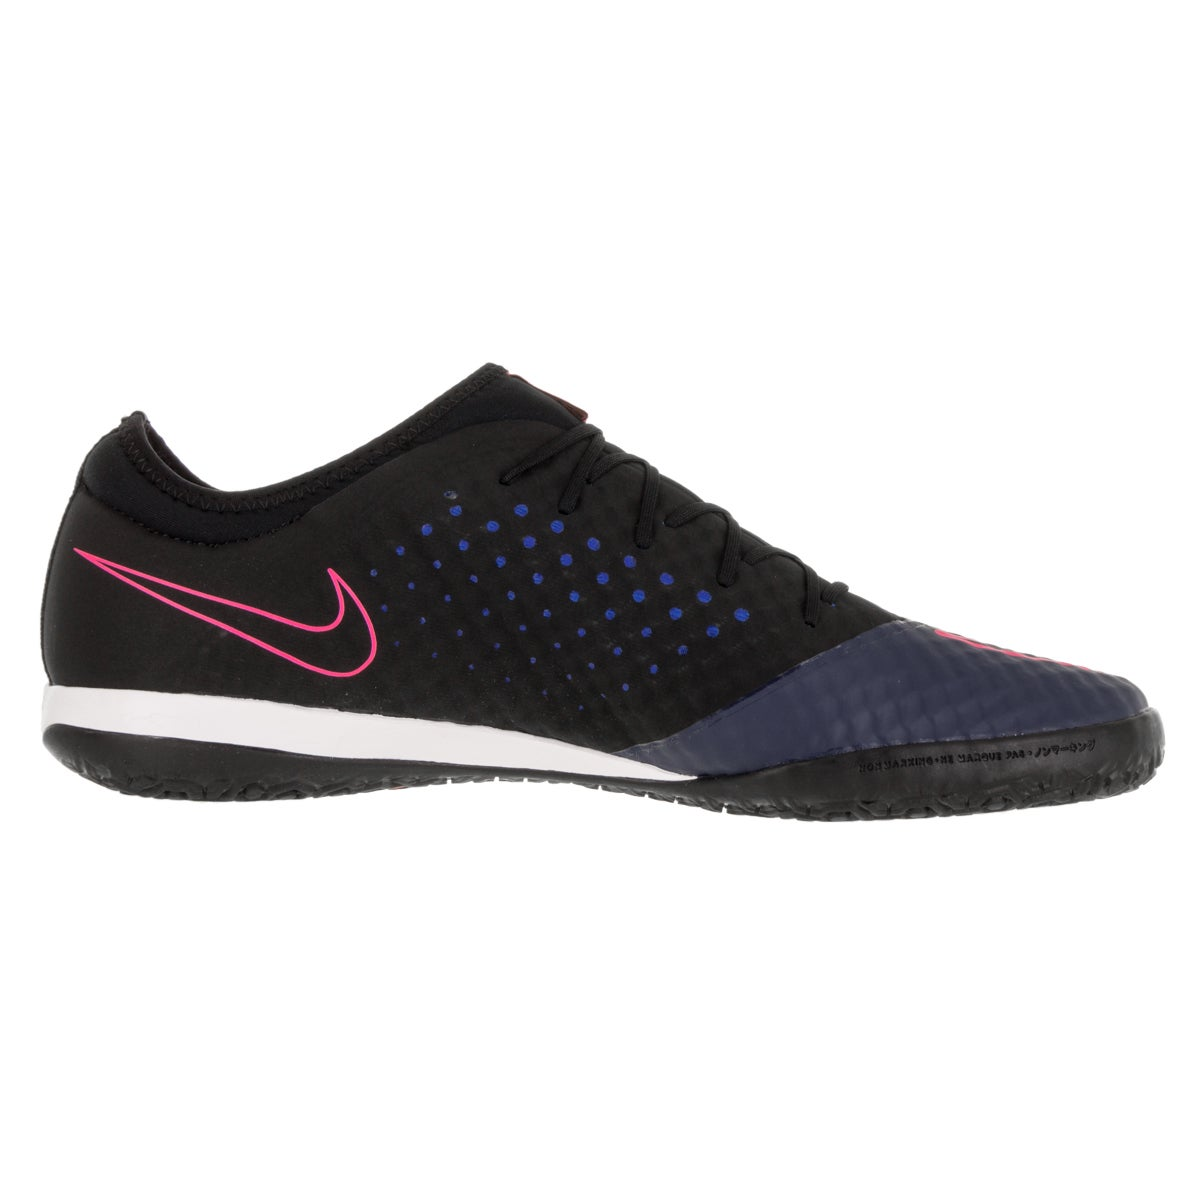 c64e3bb3ef8 Shop Nike Men s Mercurialx Finale IC Mid Navy Mid Navy Black Pink Blast  Indoor Soccer Shoe - Free Shipping Today - Overstock - 13394988